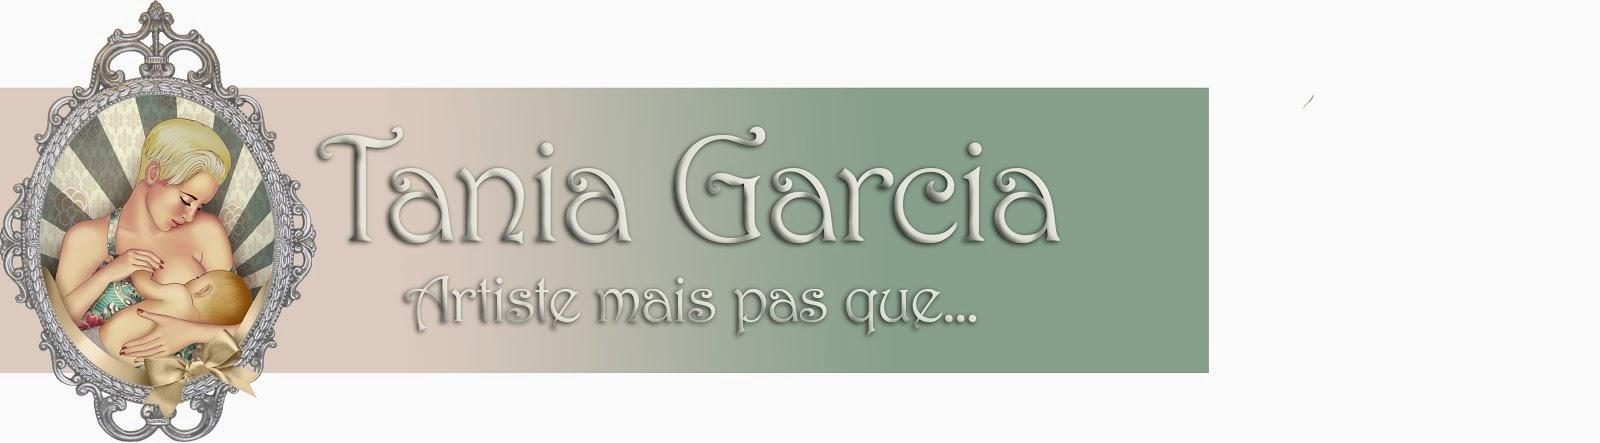 Tania Garcia Art